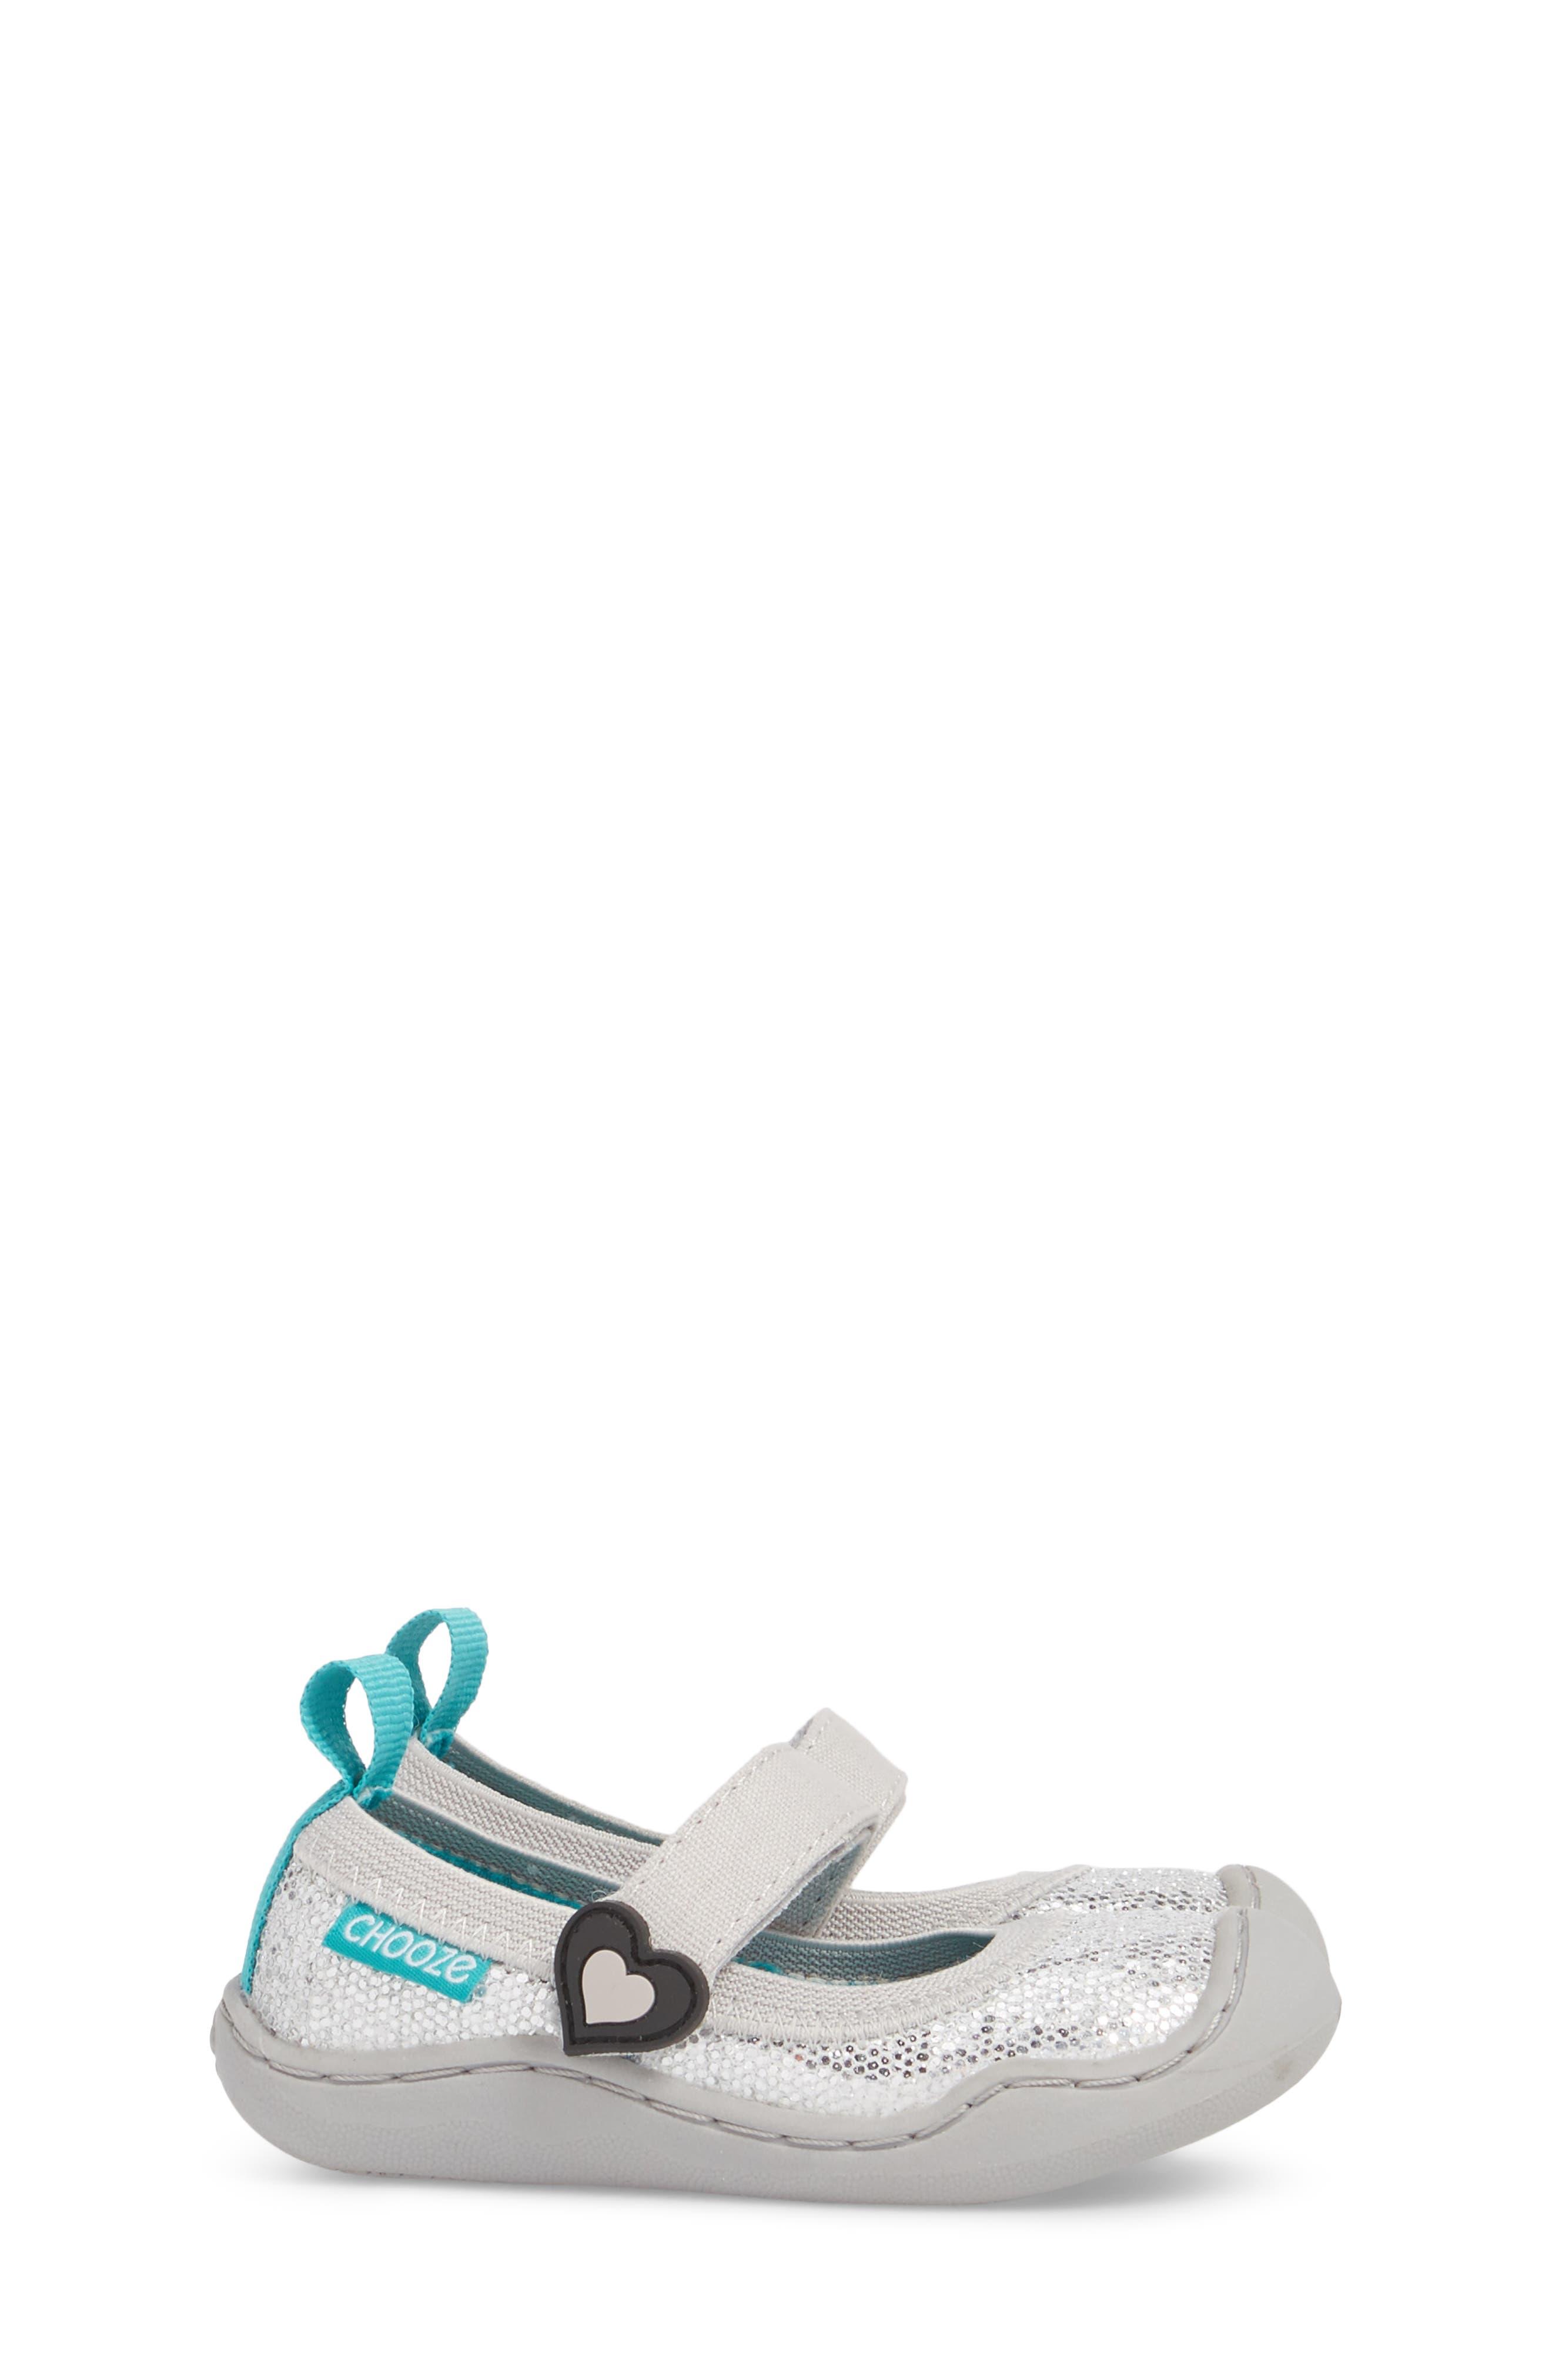 CHOOZE, Steady Shimmer Mary Jane Sneaker, Alternate thumbnail 4, color, GLOW PLATINUM